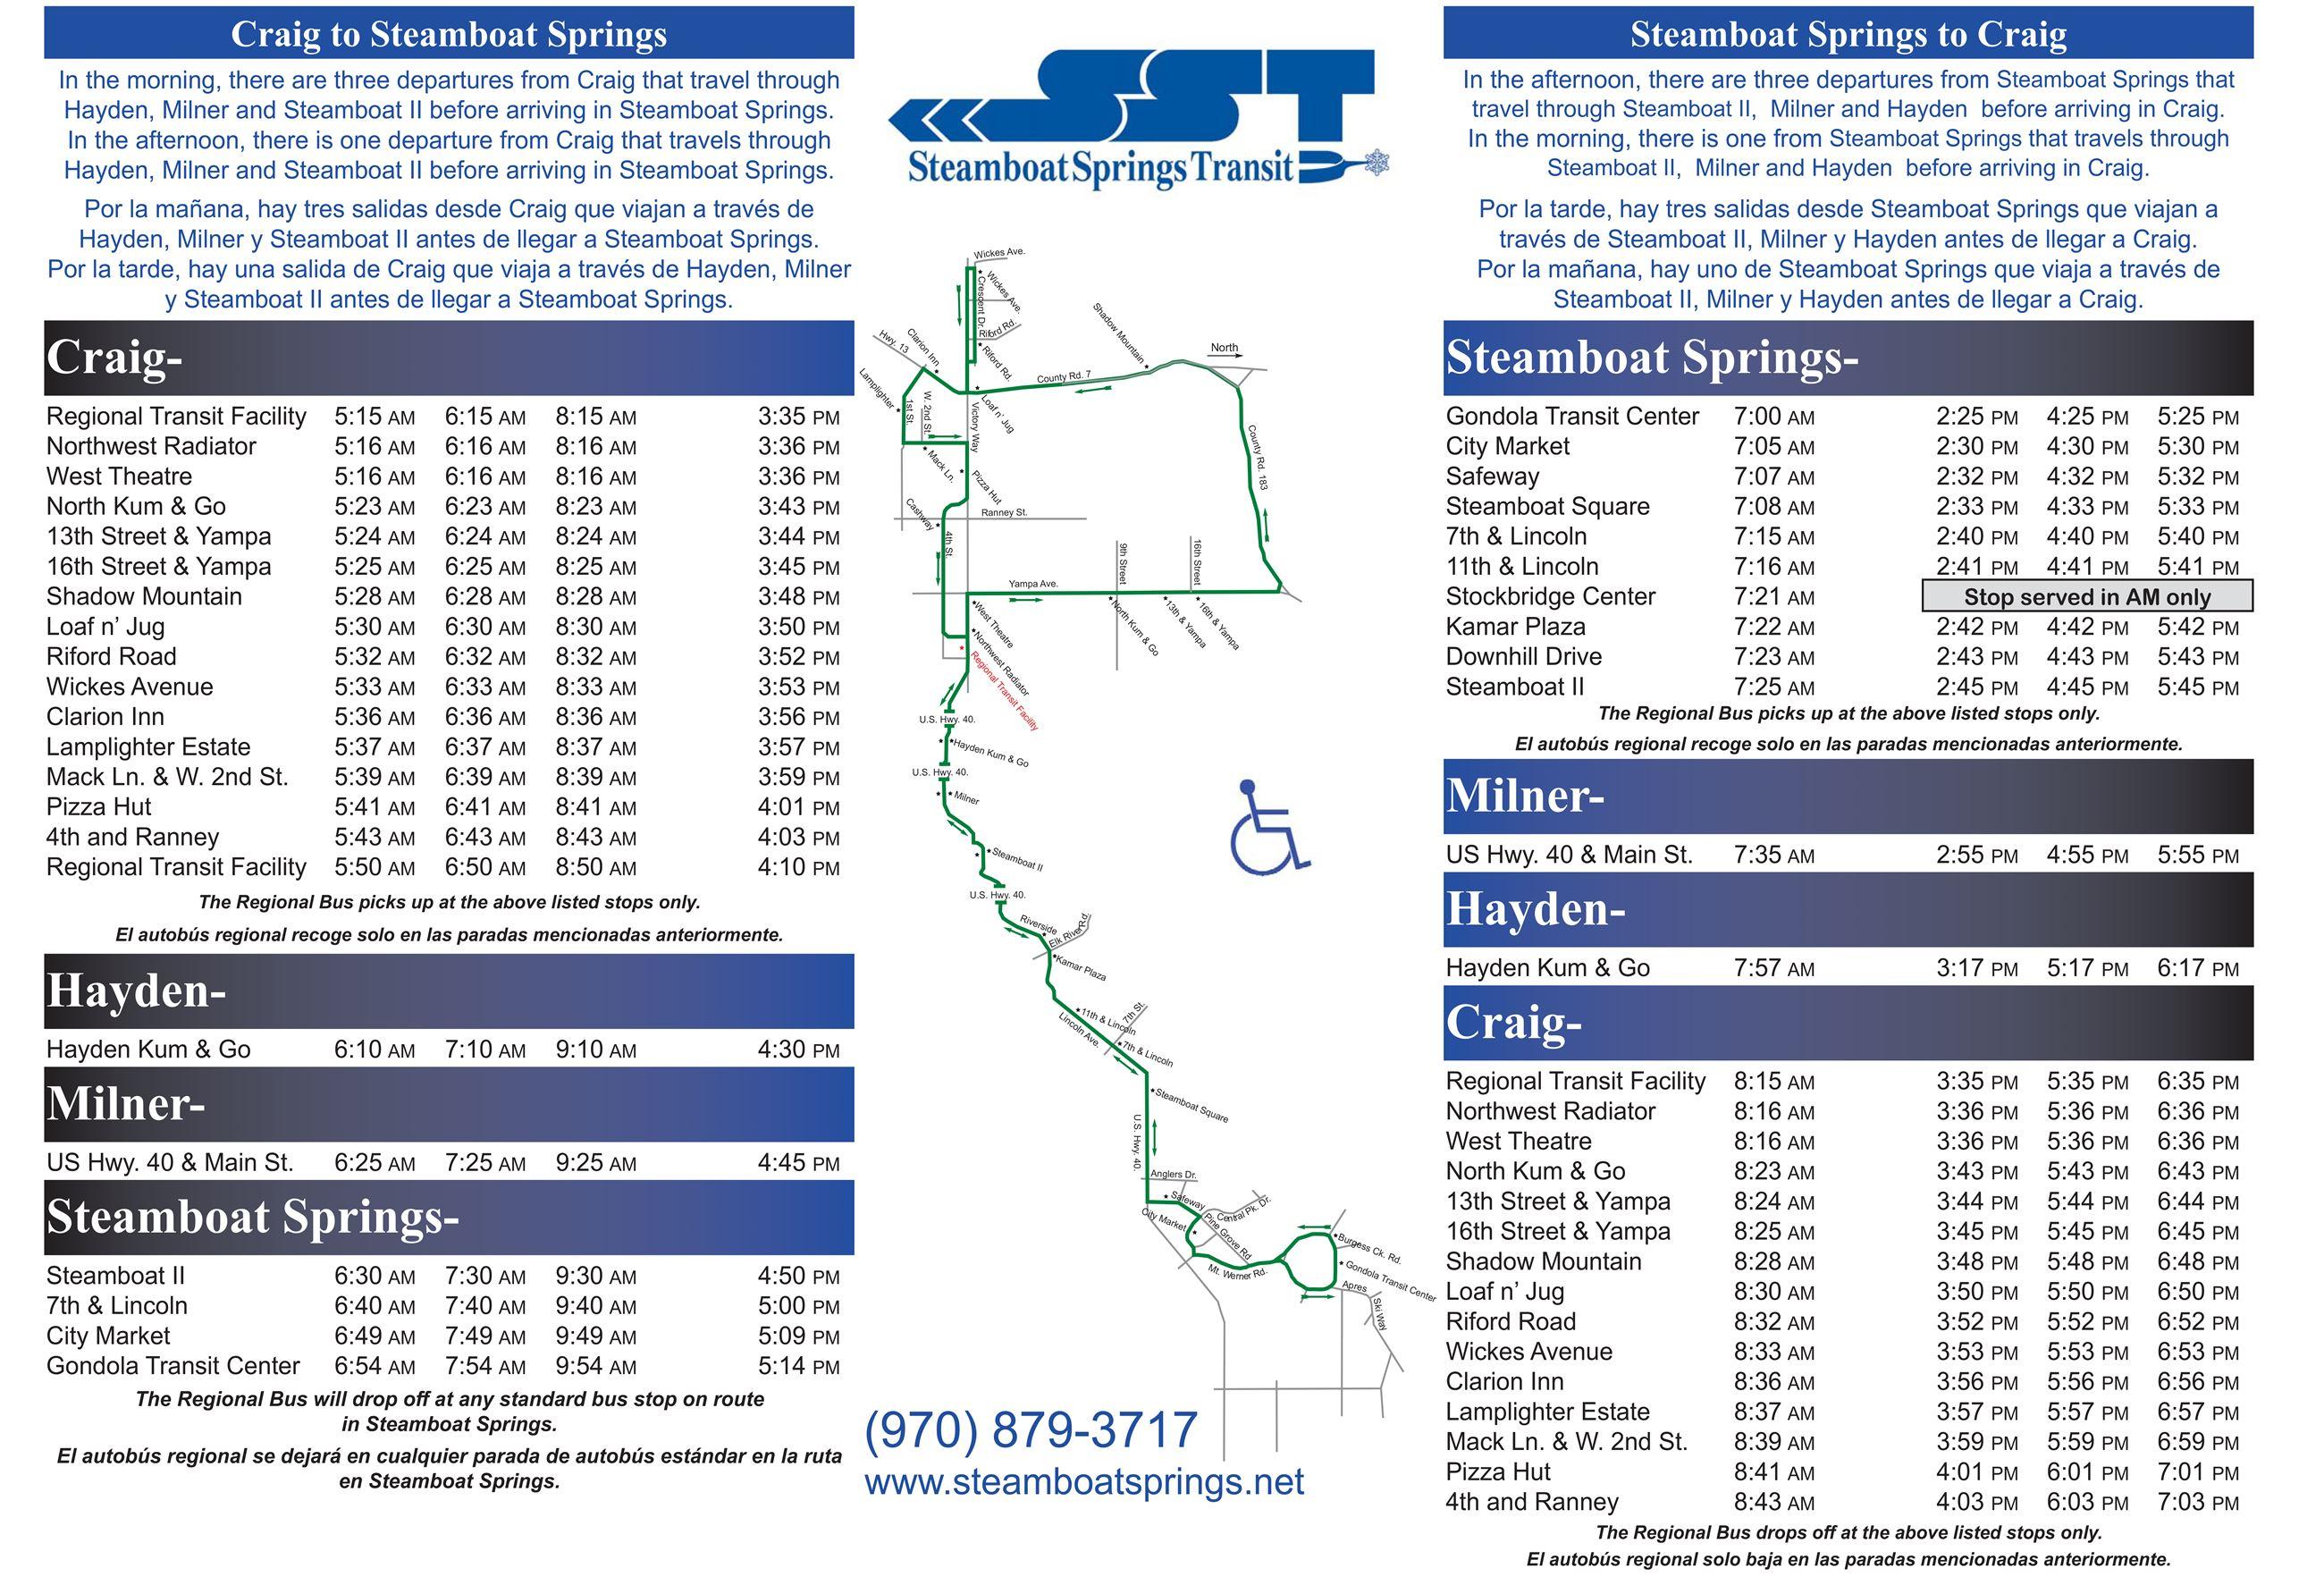 steamboat springs transit steamboat springs co official website steamboat springs transit steamboat